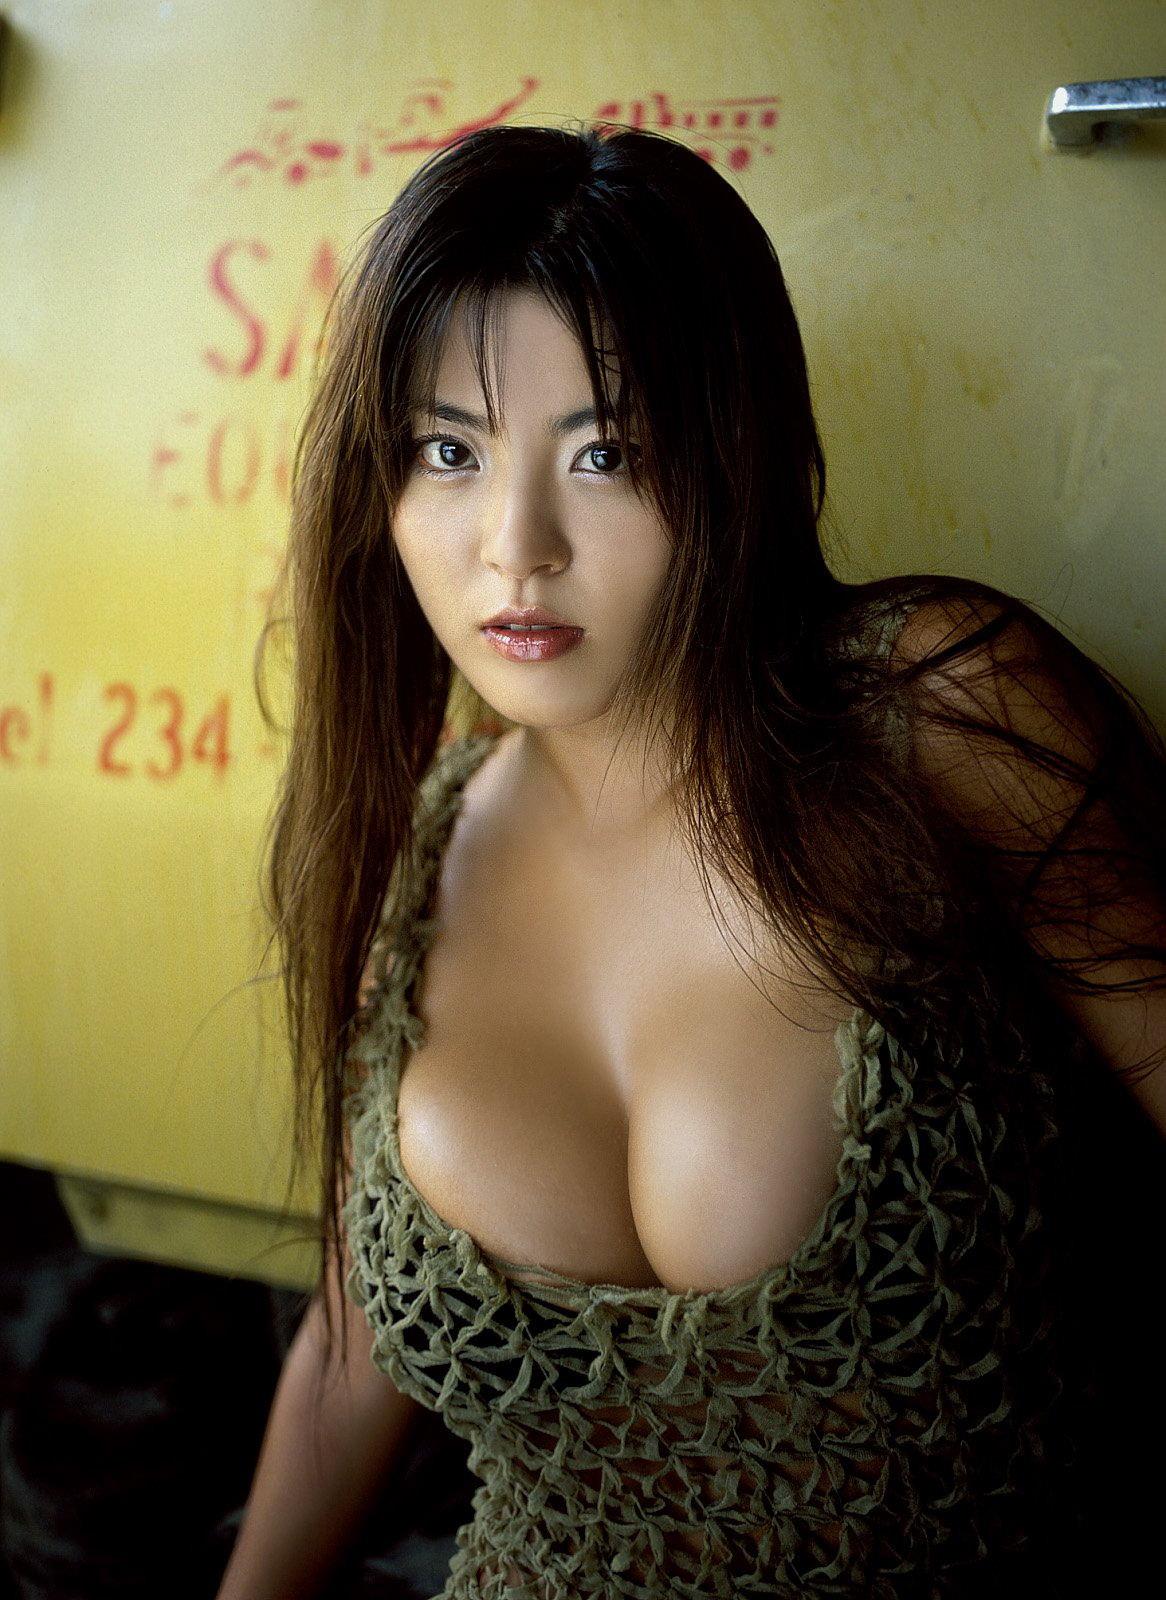 Harumi Nemoto Photo Gallery